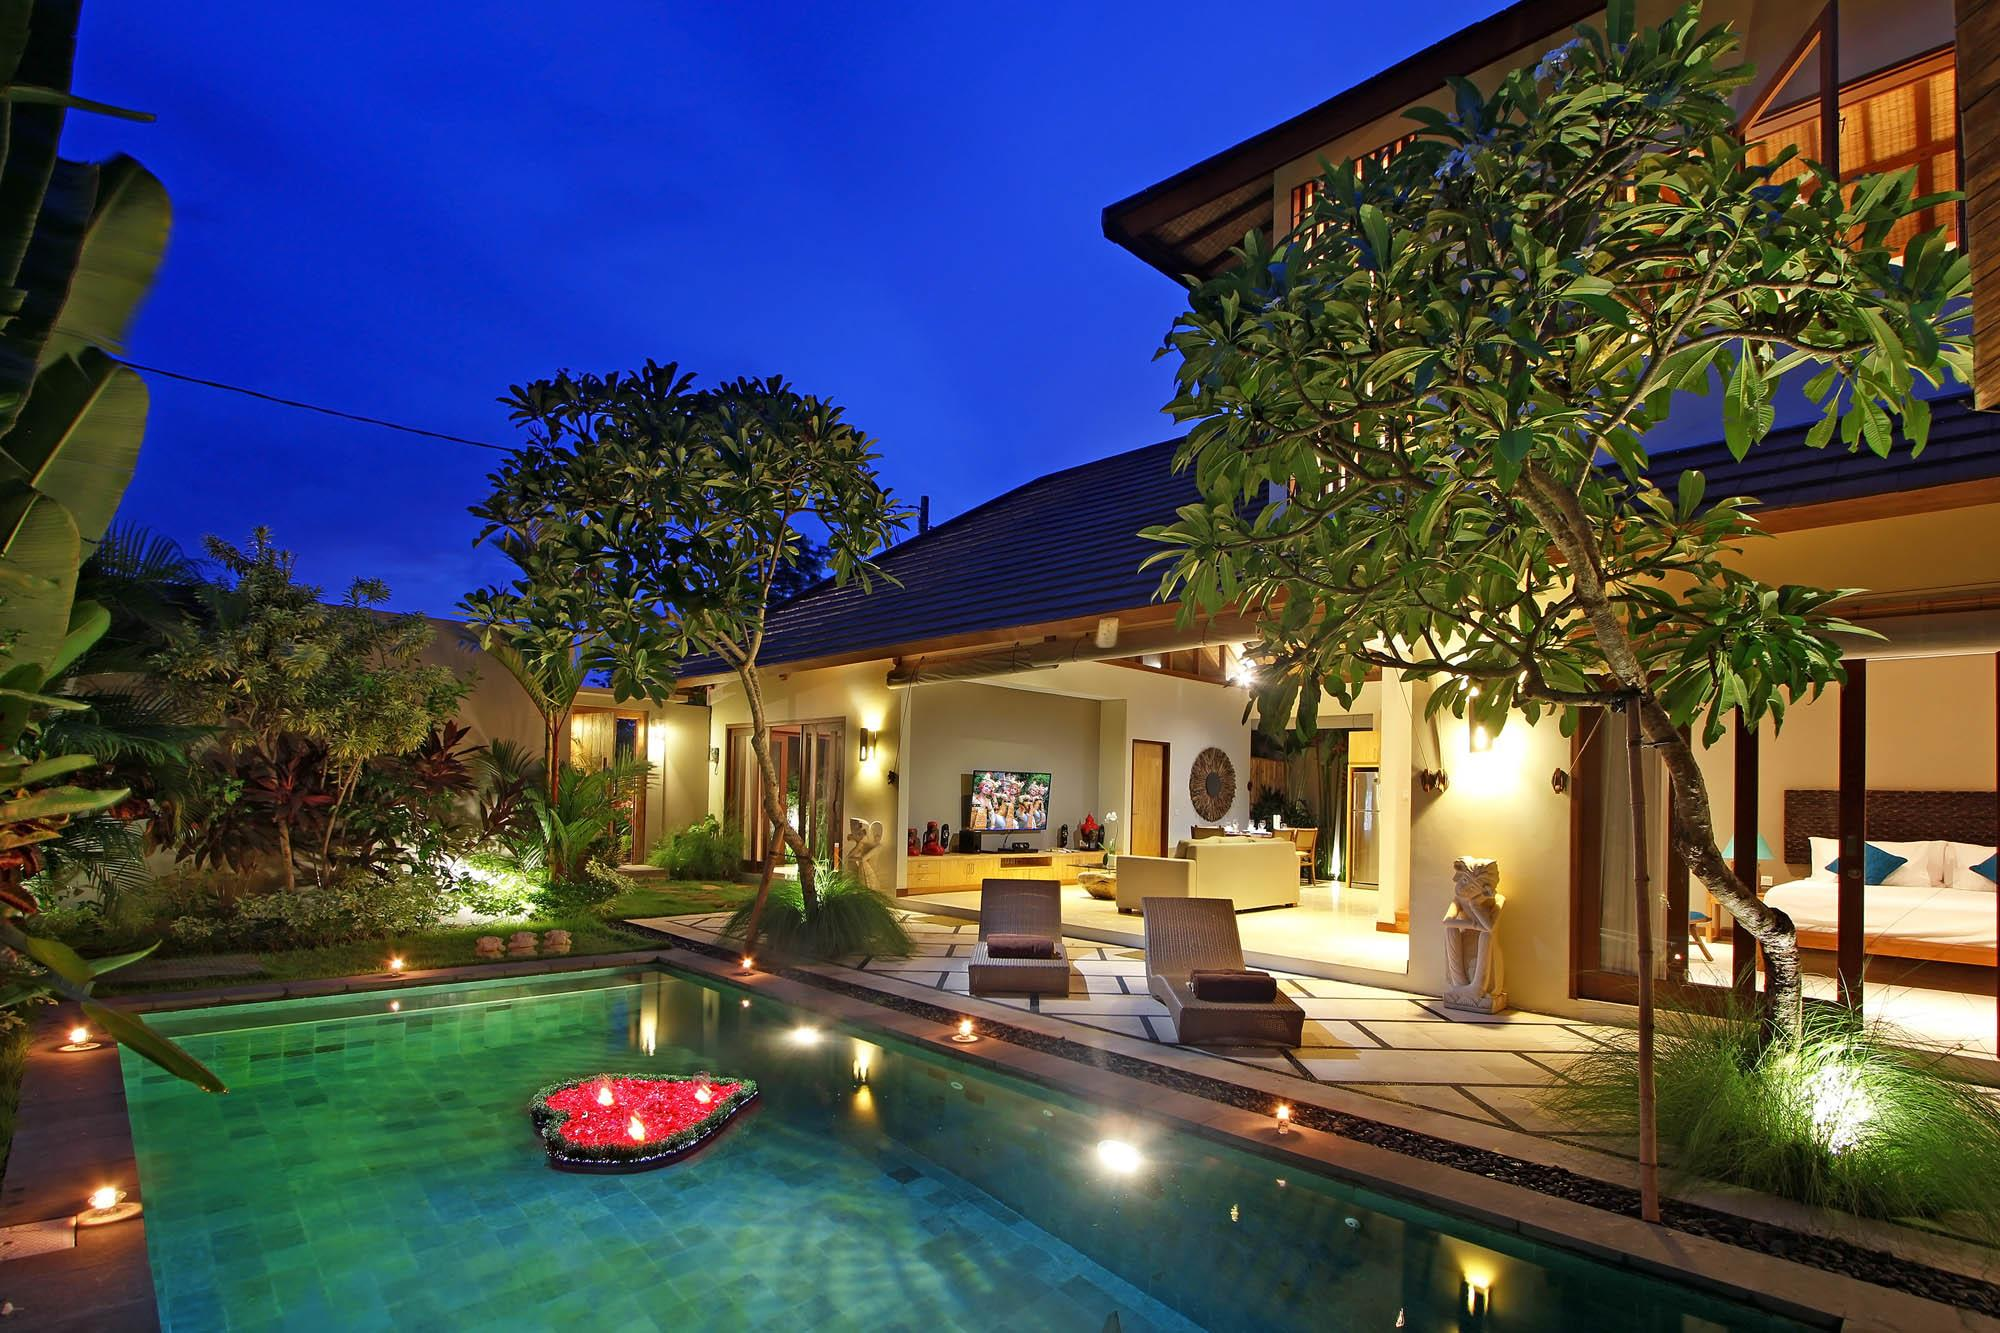 Desa di Bali Villas ホテル詳細